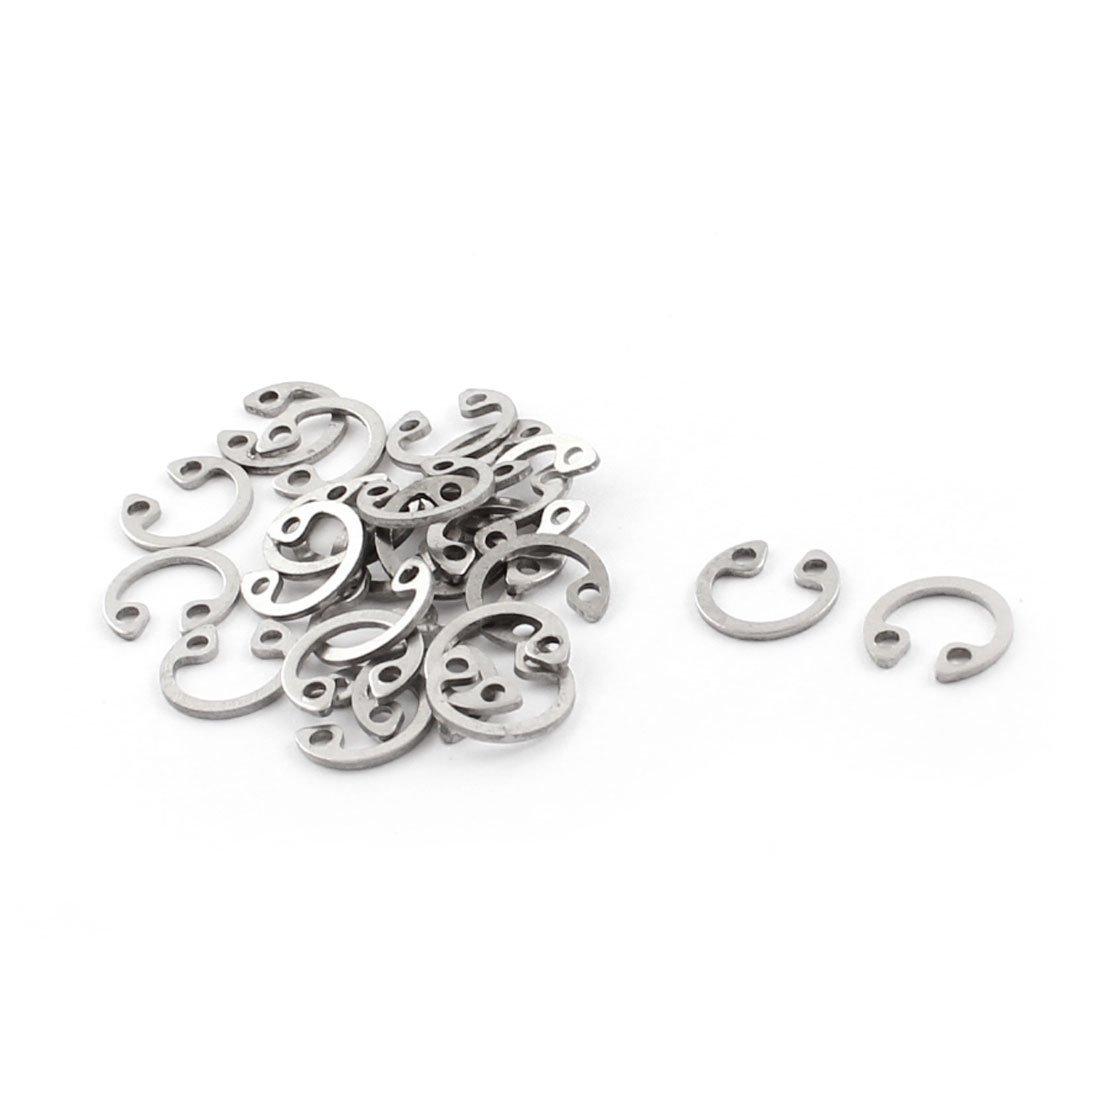 25pcs 304 Stainless Steel Internal Circlip Snap Ring 7mm Inner Dia